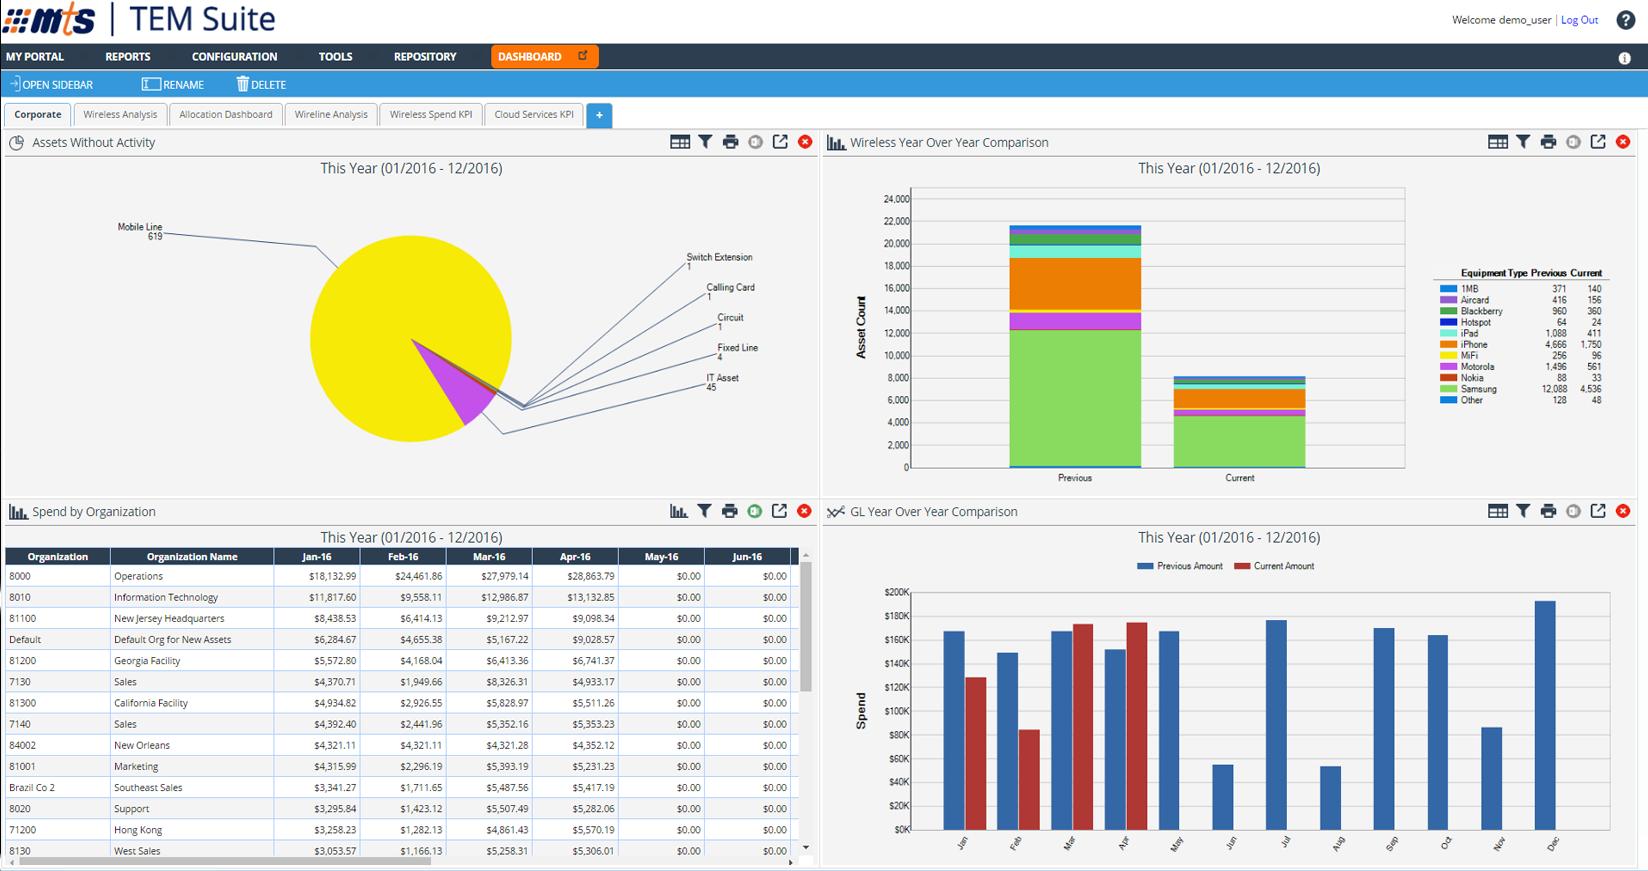 eXsight Software - Invoice management